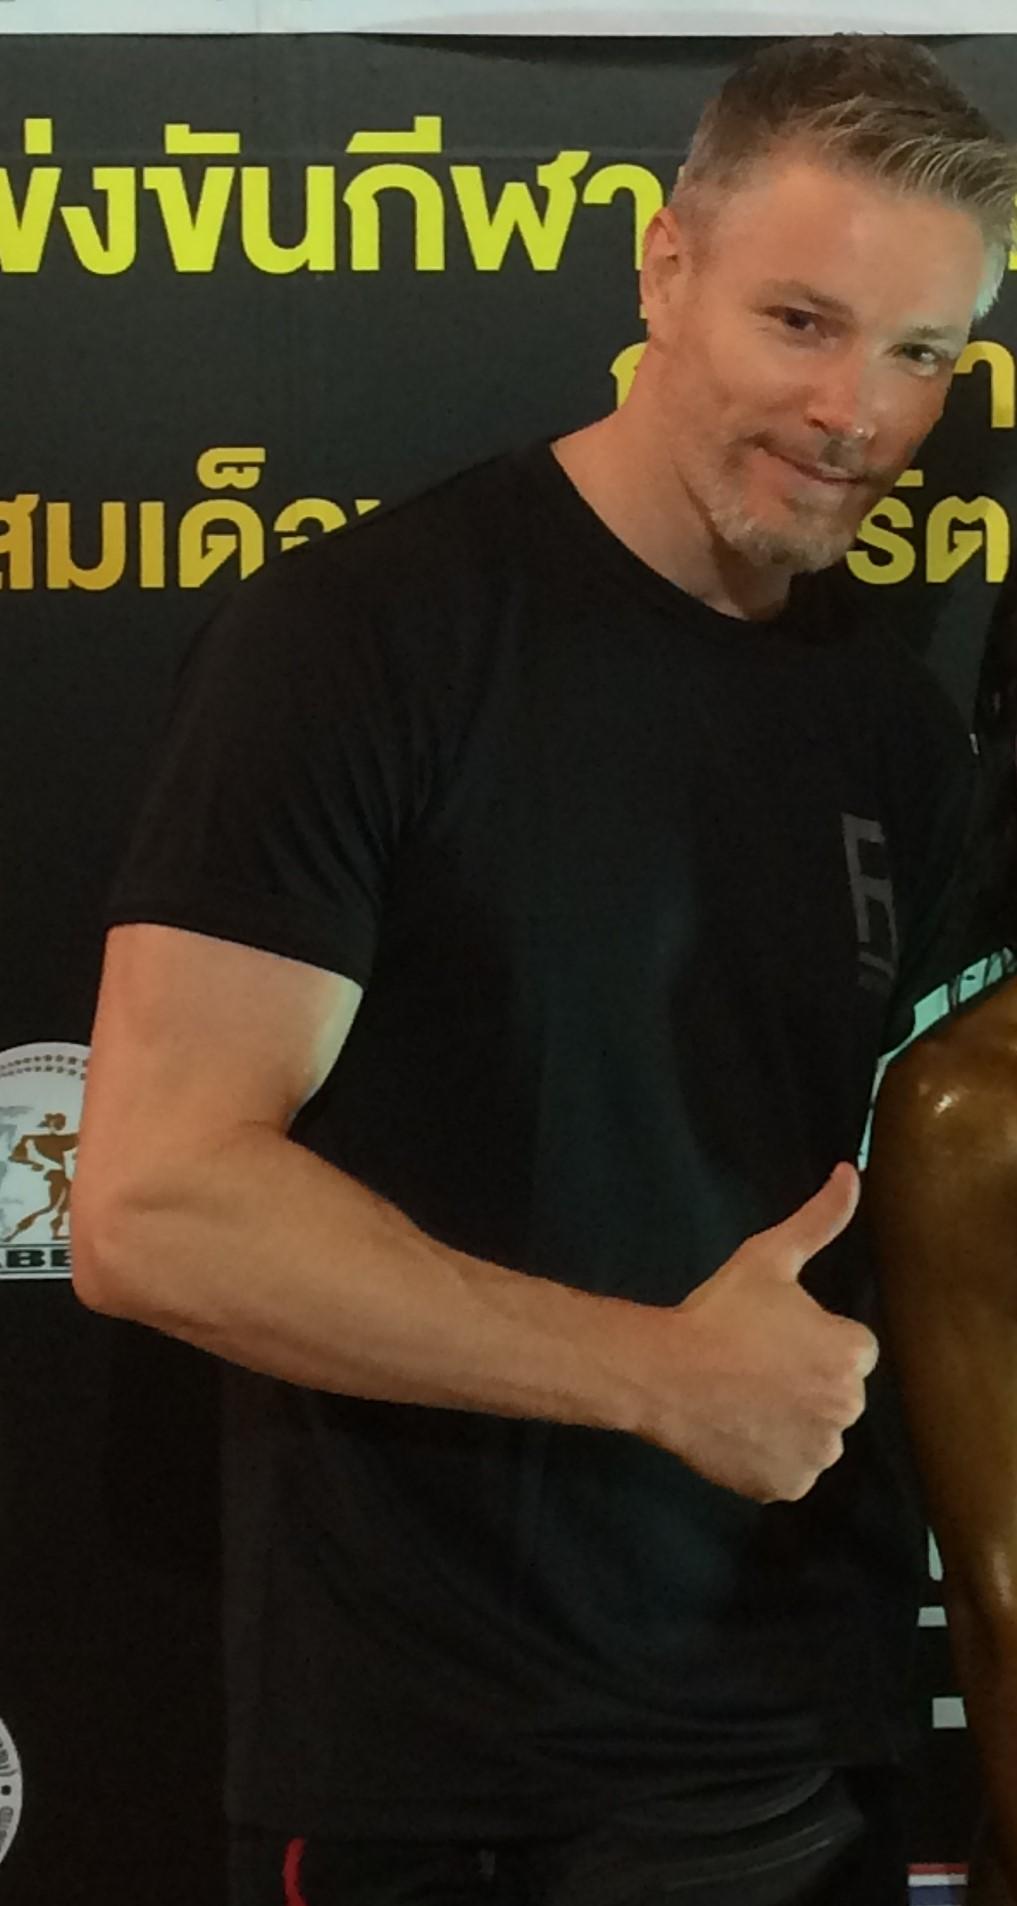 Peter_Tuinstra_at_Mr._Thailand_2016.jpg